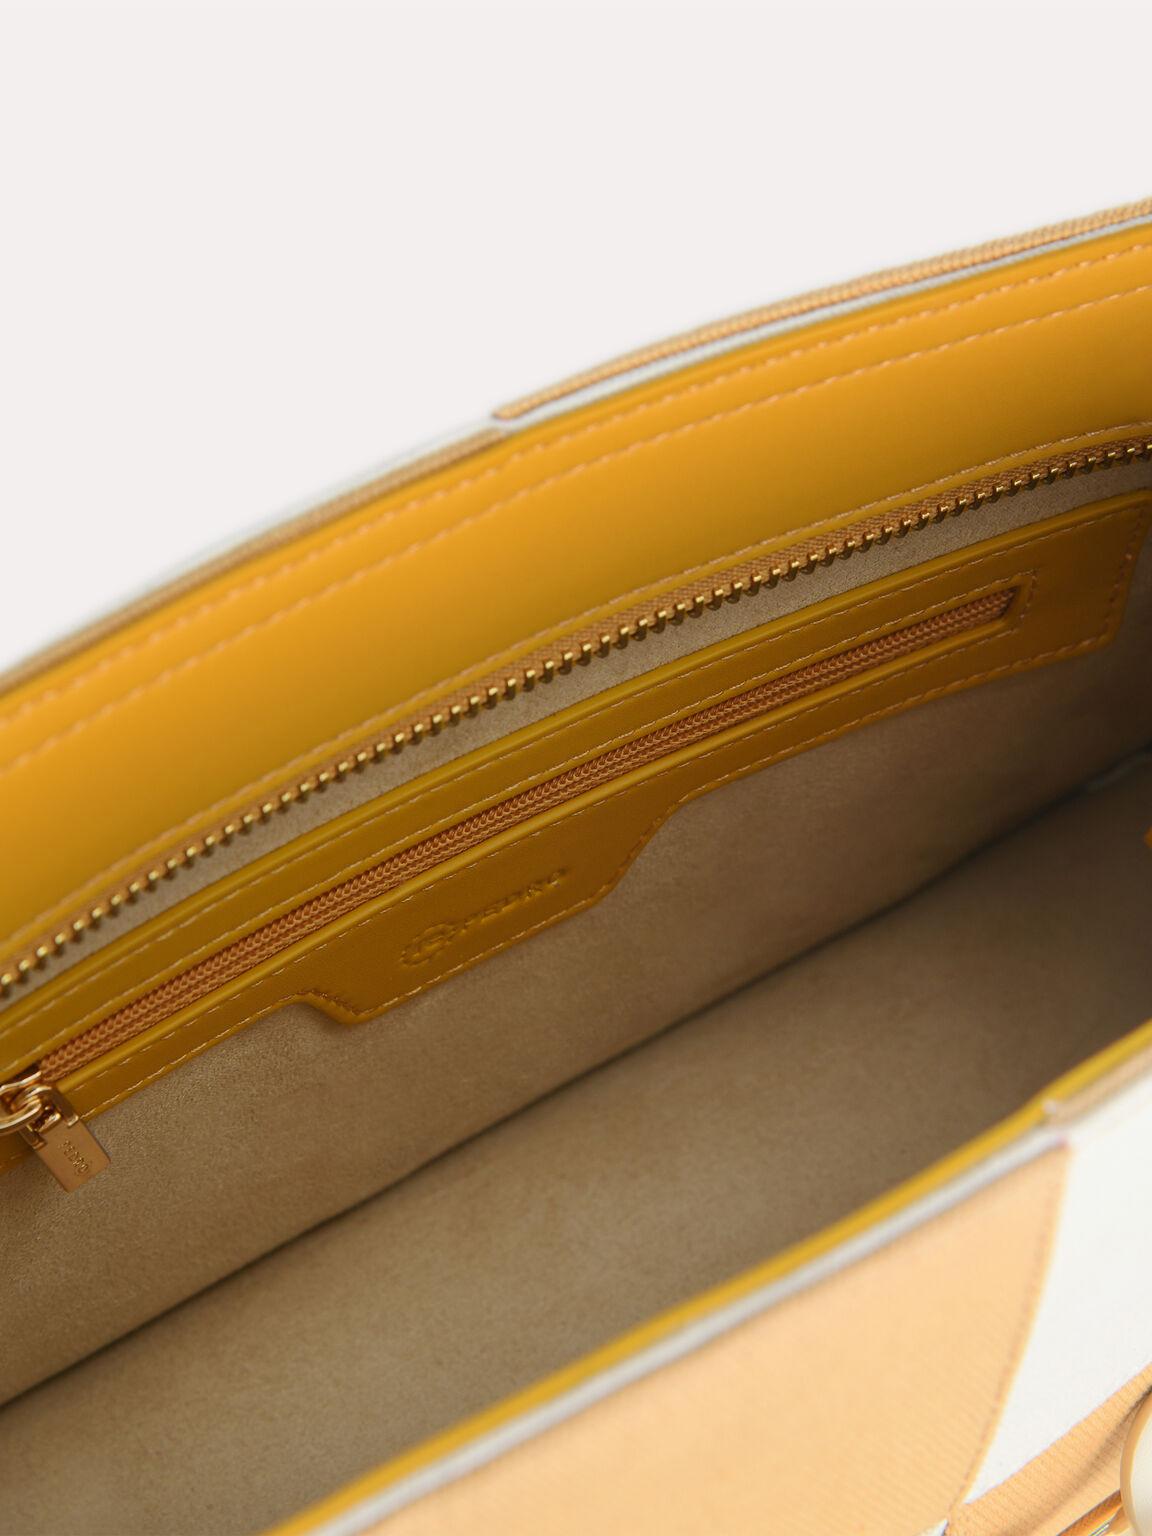 rePEDRO Duo-Toned Shoulder Bag, Mustard, hi-res